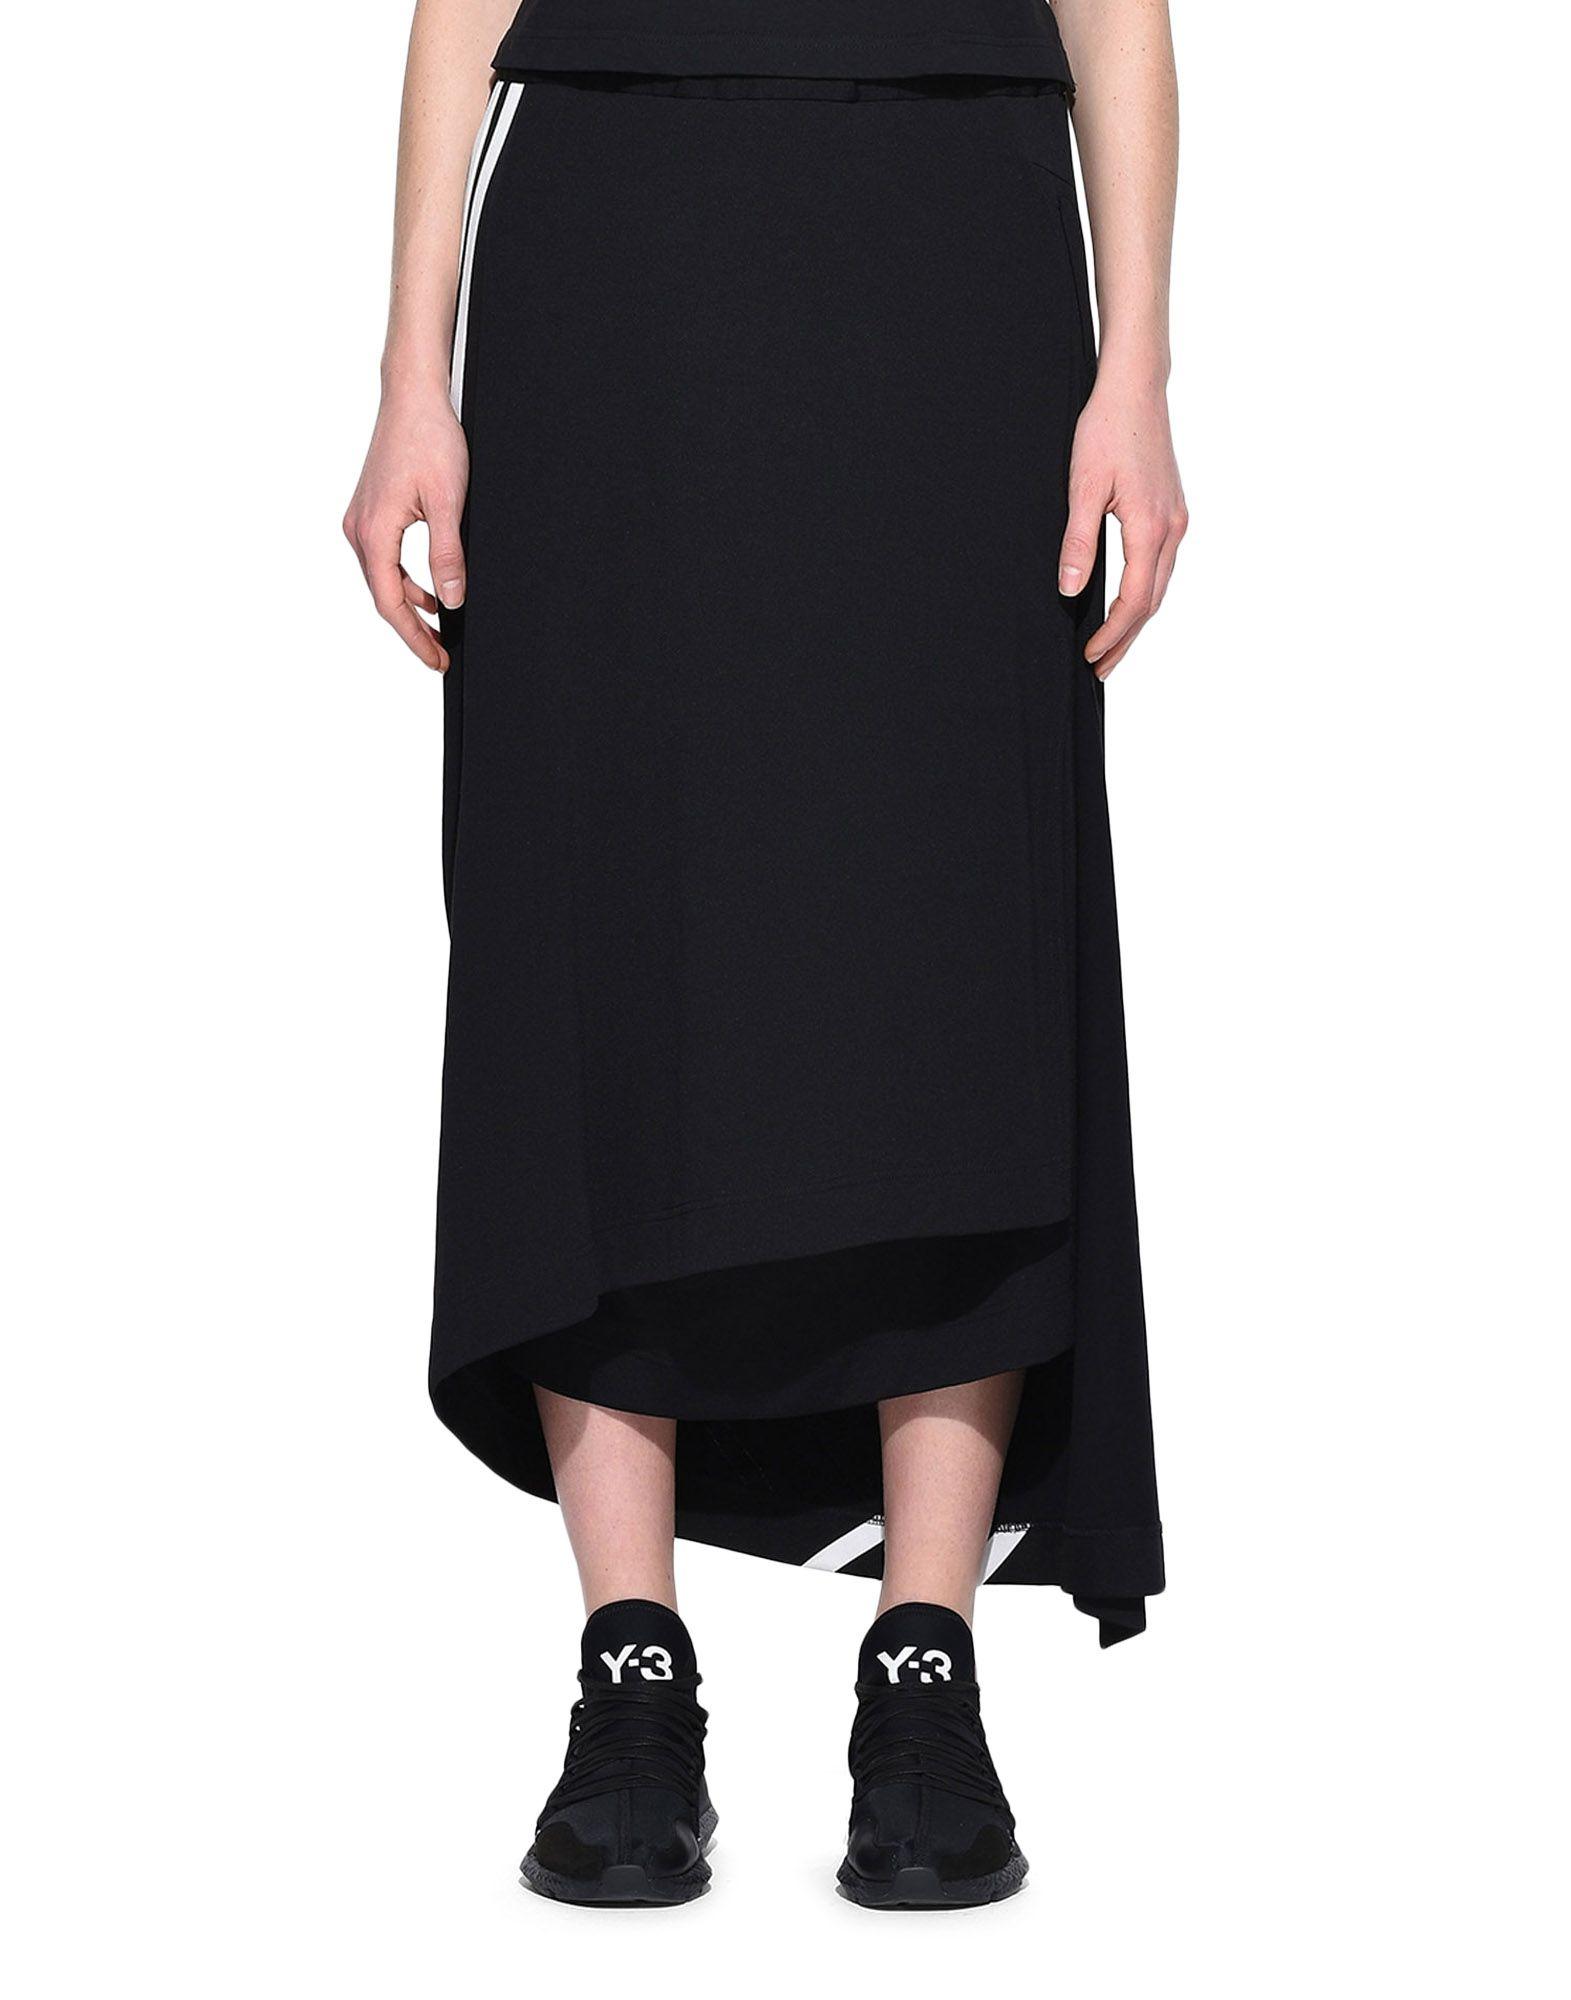 Y-3 Y-3 3-Stripes Drape Skirt Knee length skirt Woman r